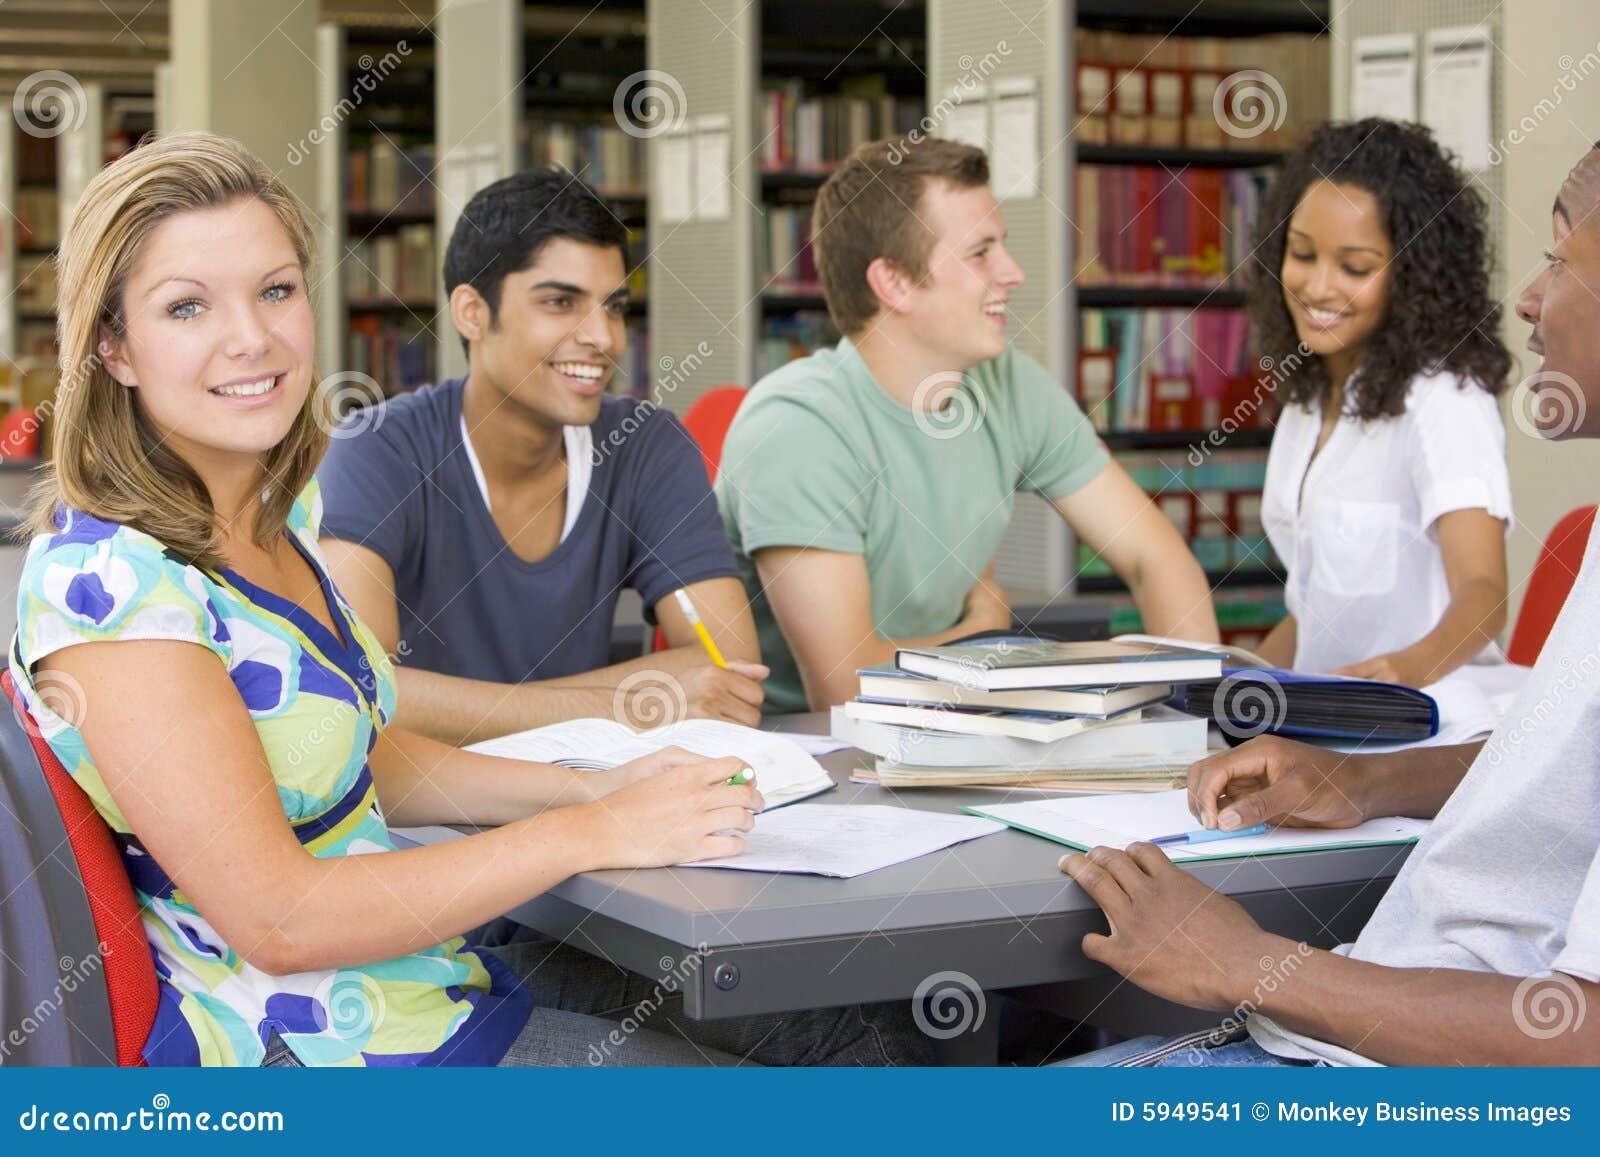 Kolegium biblioteki studentów studiuje razem